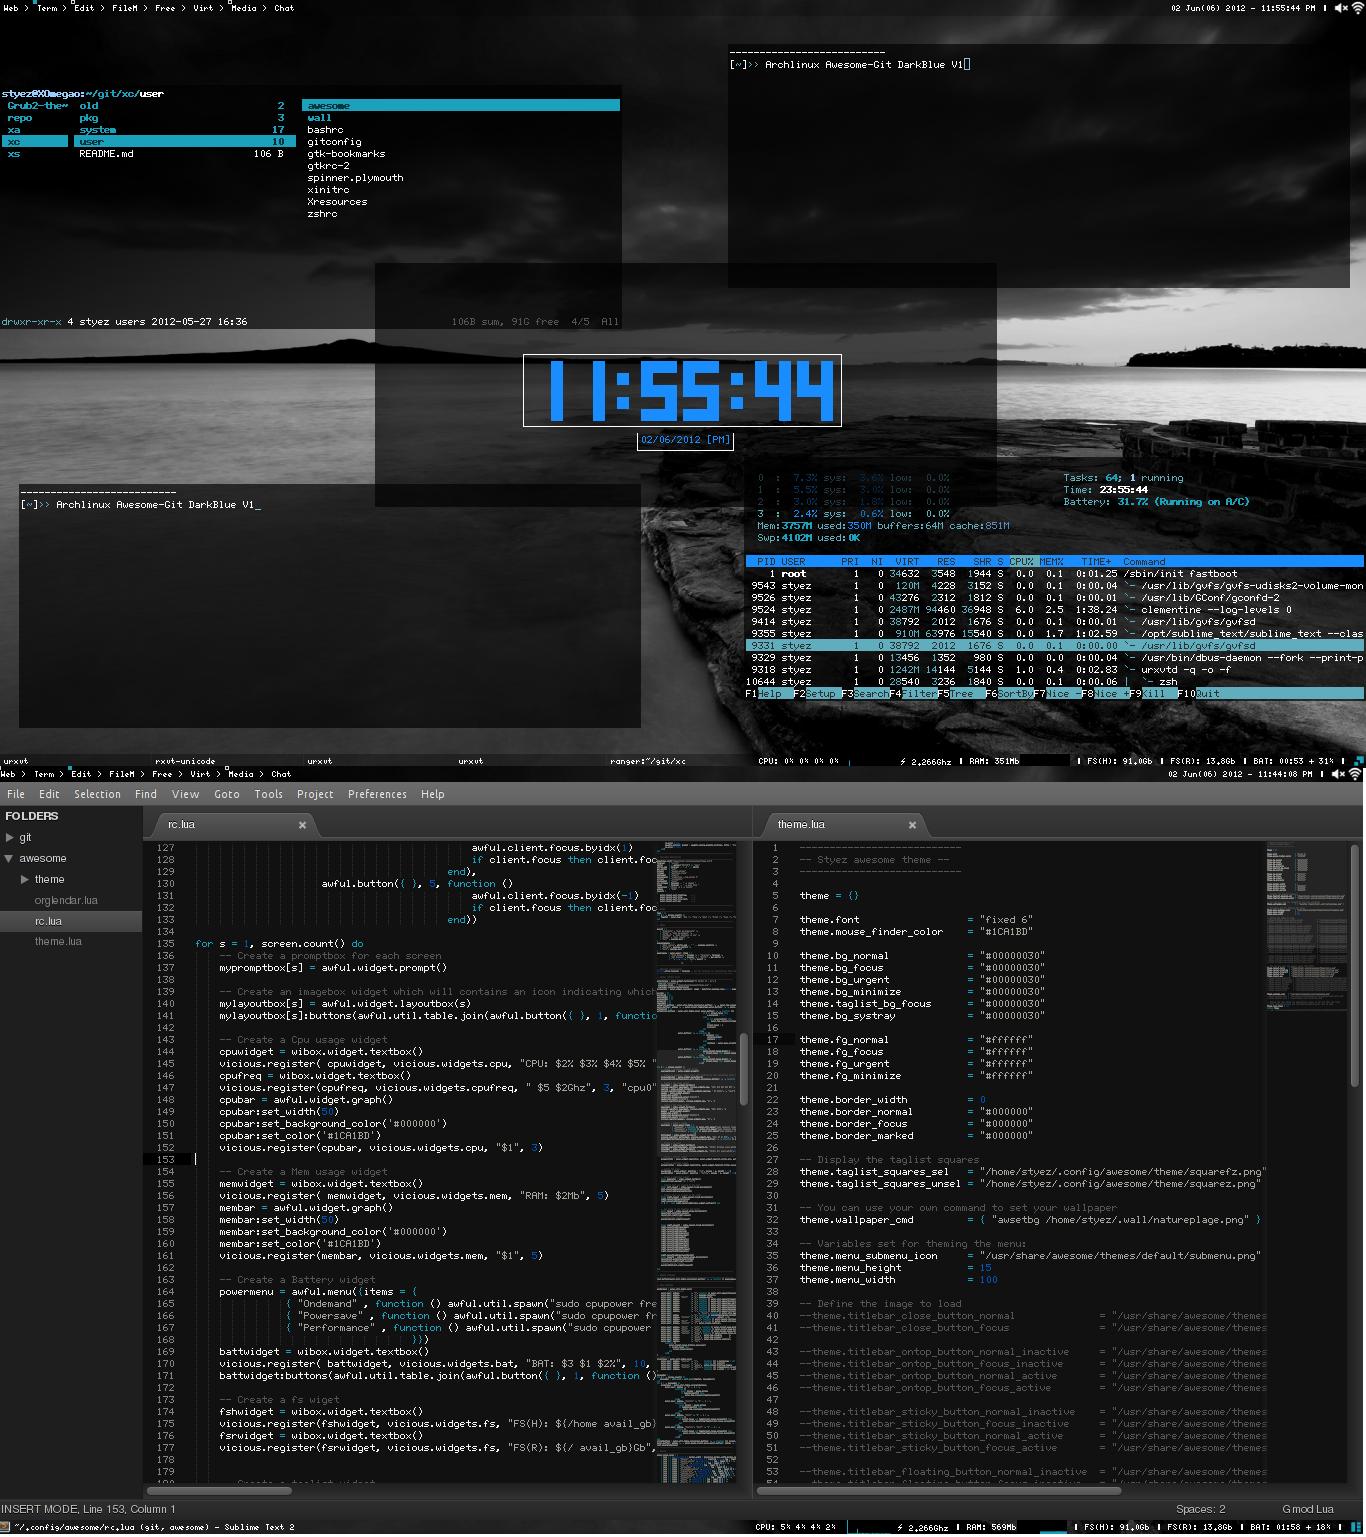 Archlinux - Awesome - V1 by wertyi48